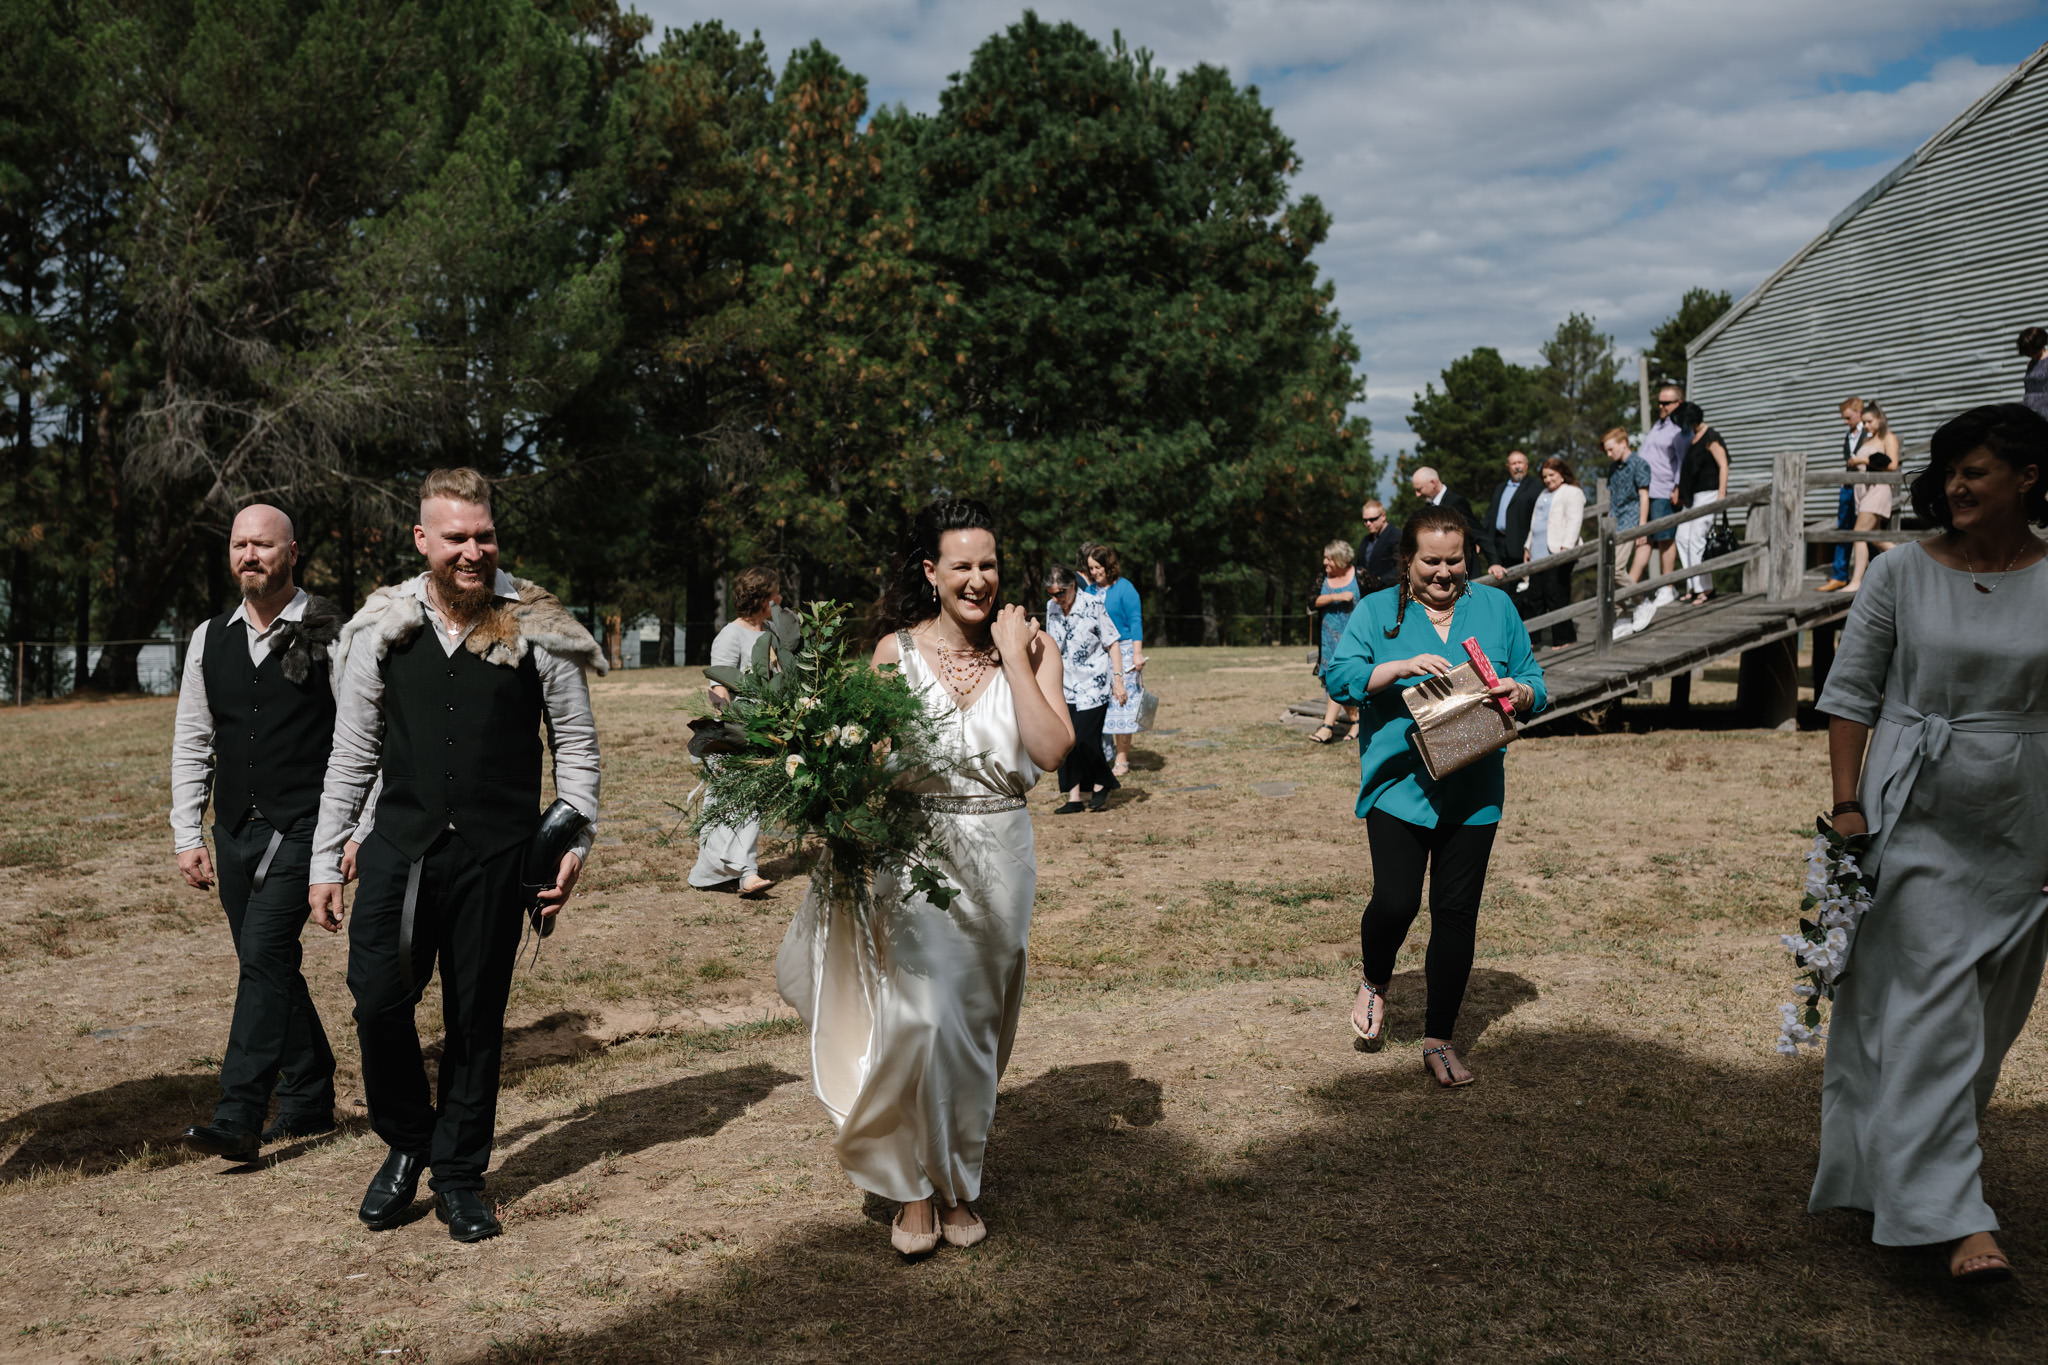 Yarralumla Woolshed Canberra Wedding Photographer Erin Latimore_141.JPG